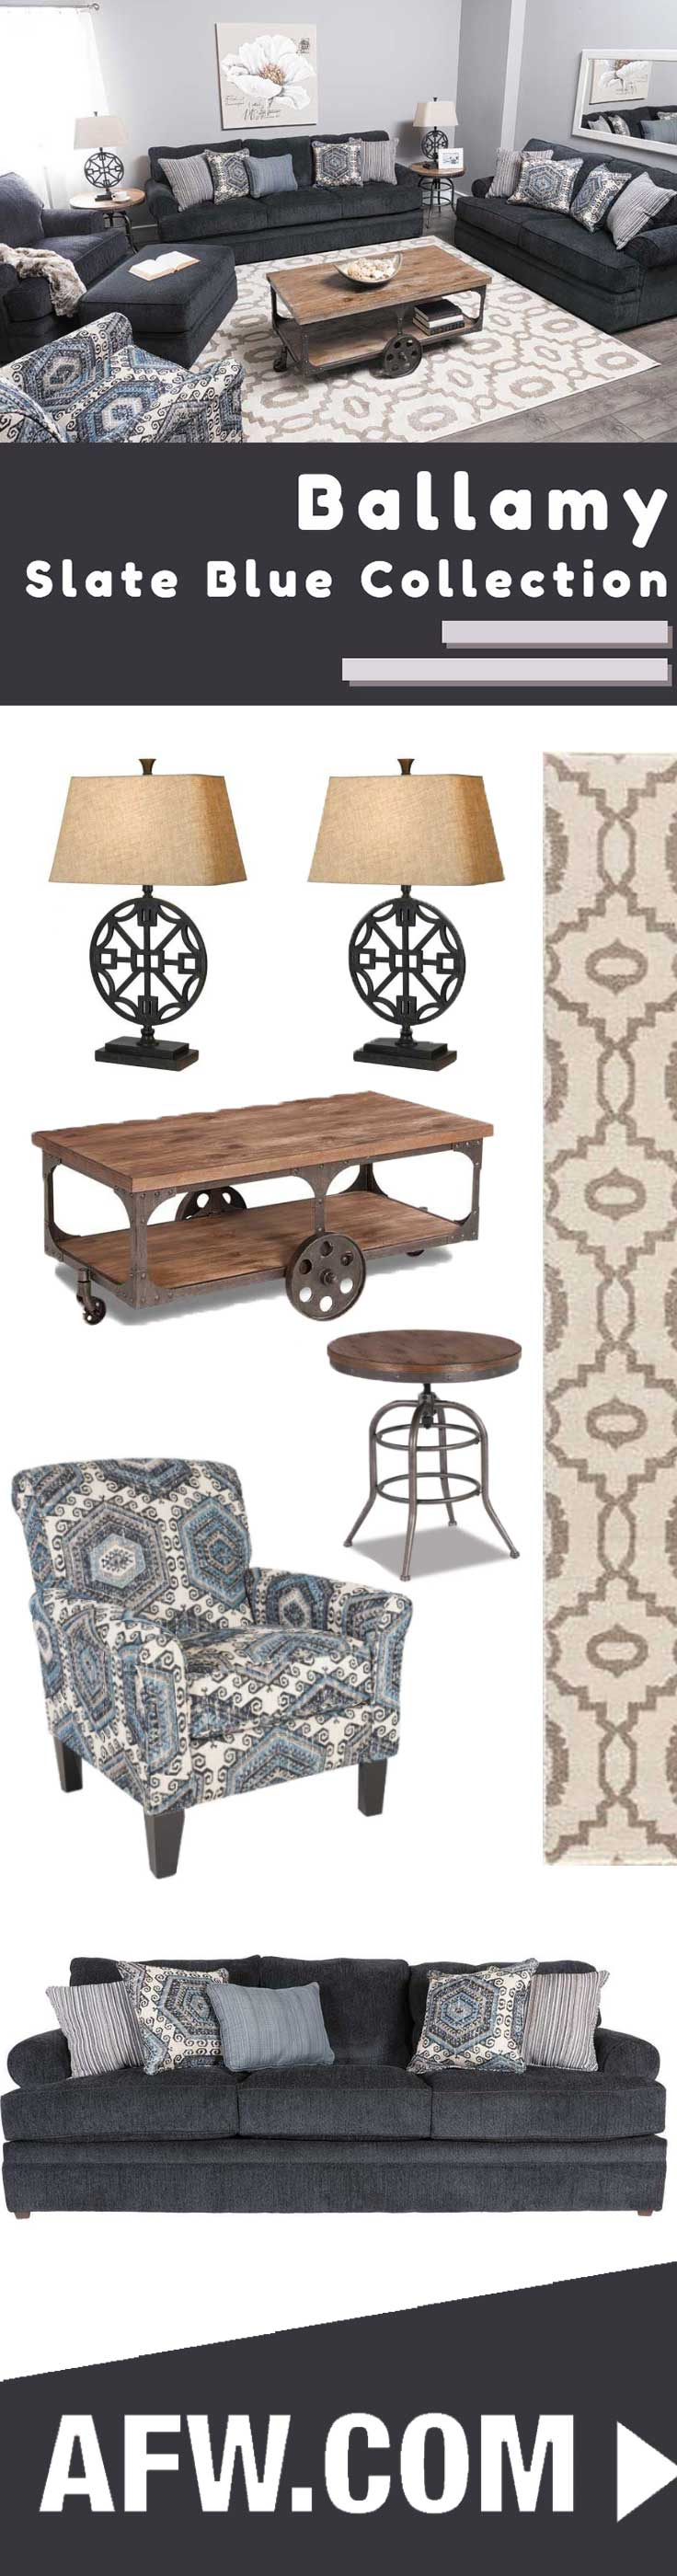 Bellamy Slate Blue Sofa   Slate, Upholstery and Living rooms